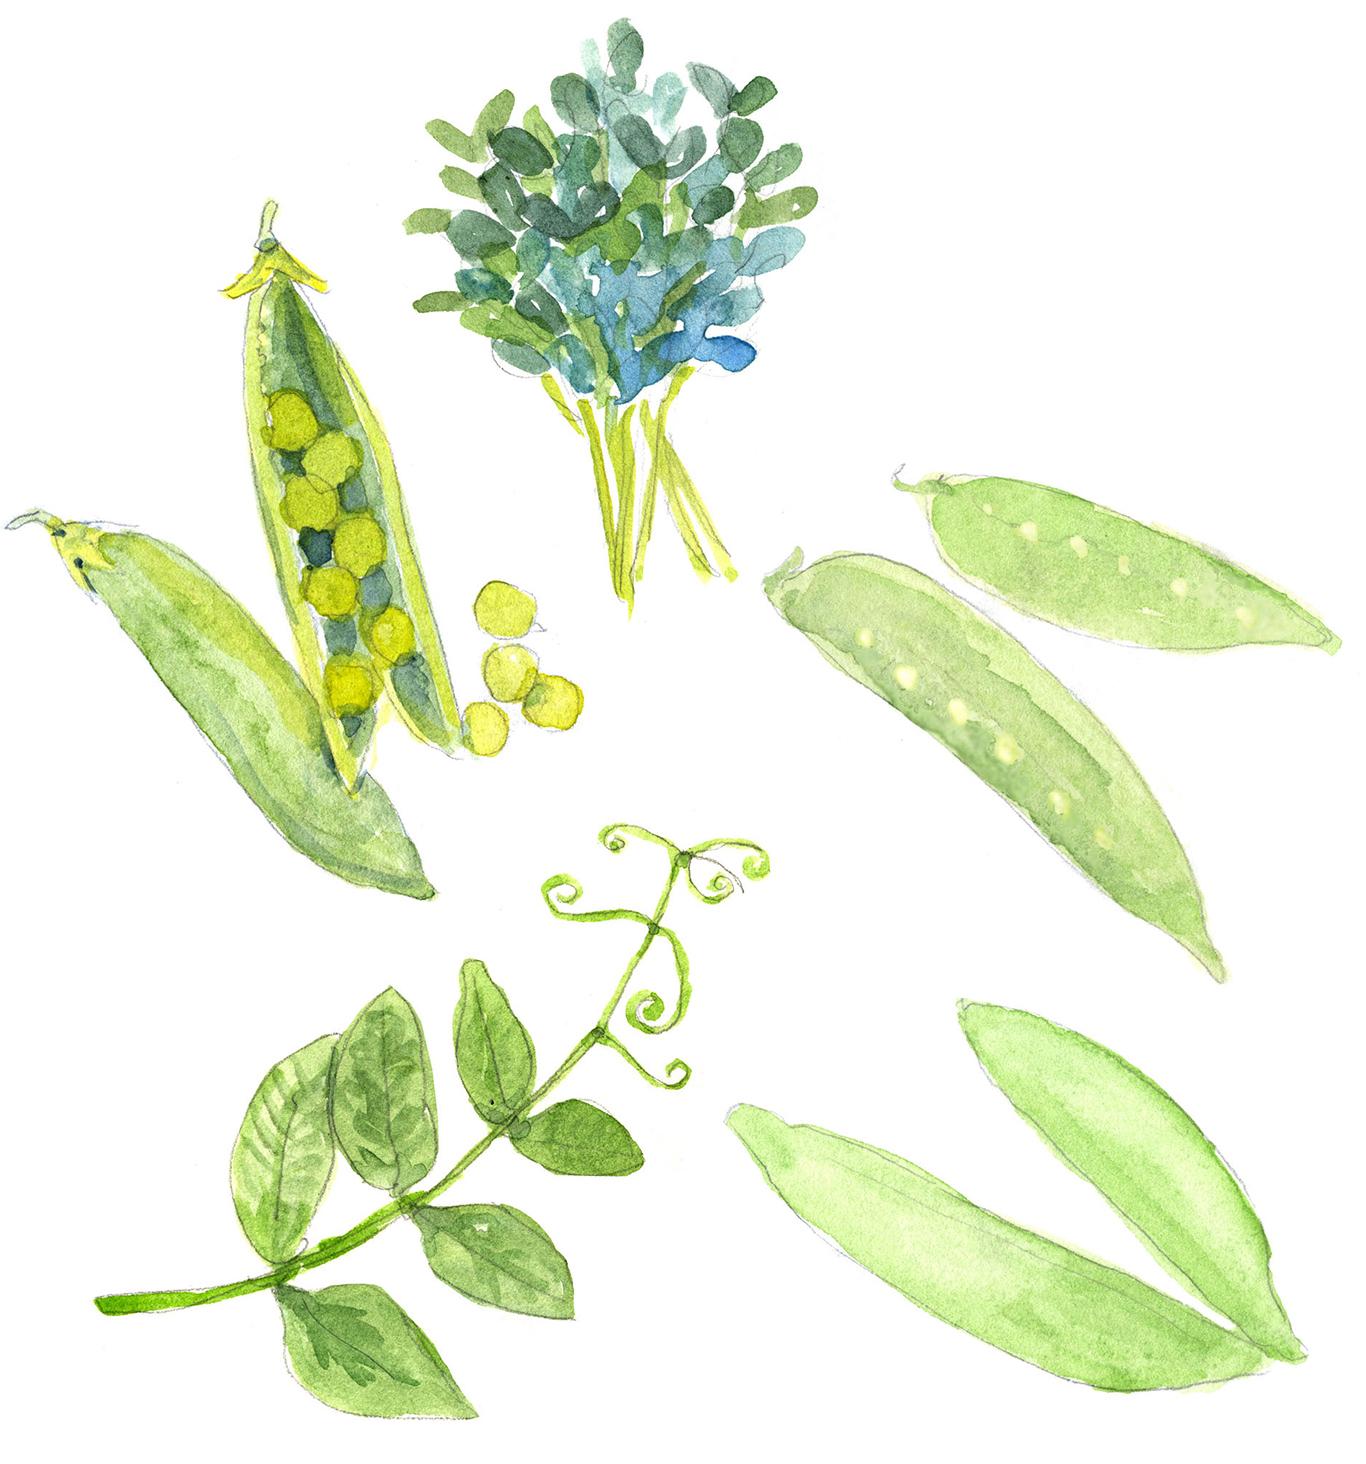 types of peas illustration